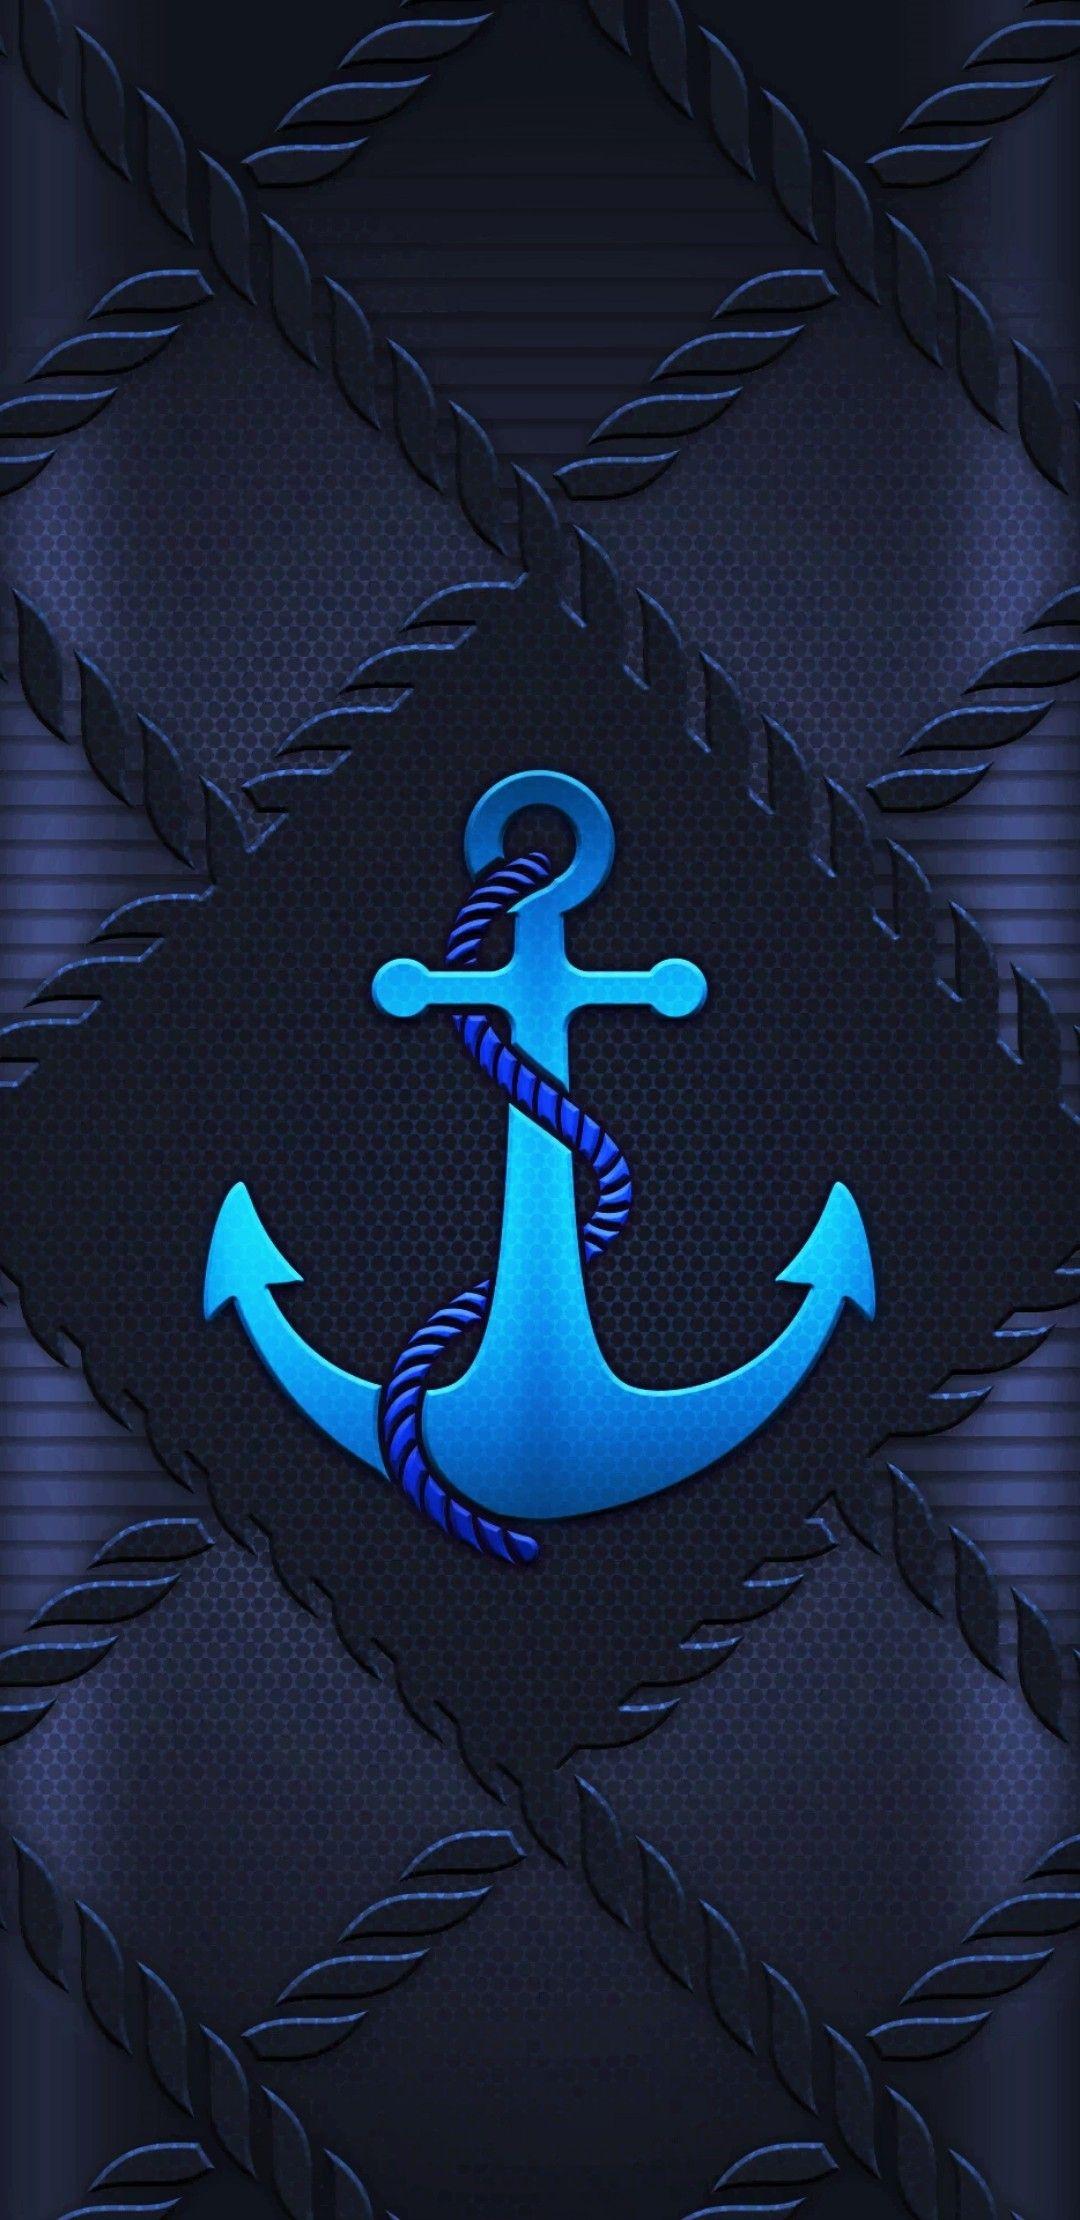 Pin by ☆♡ Fenedhis Lasa ♡☆ on Edge Effect Navy wallpaper